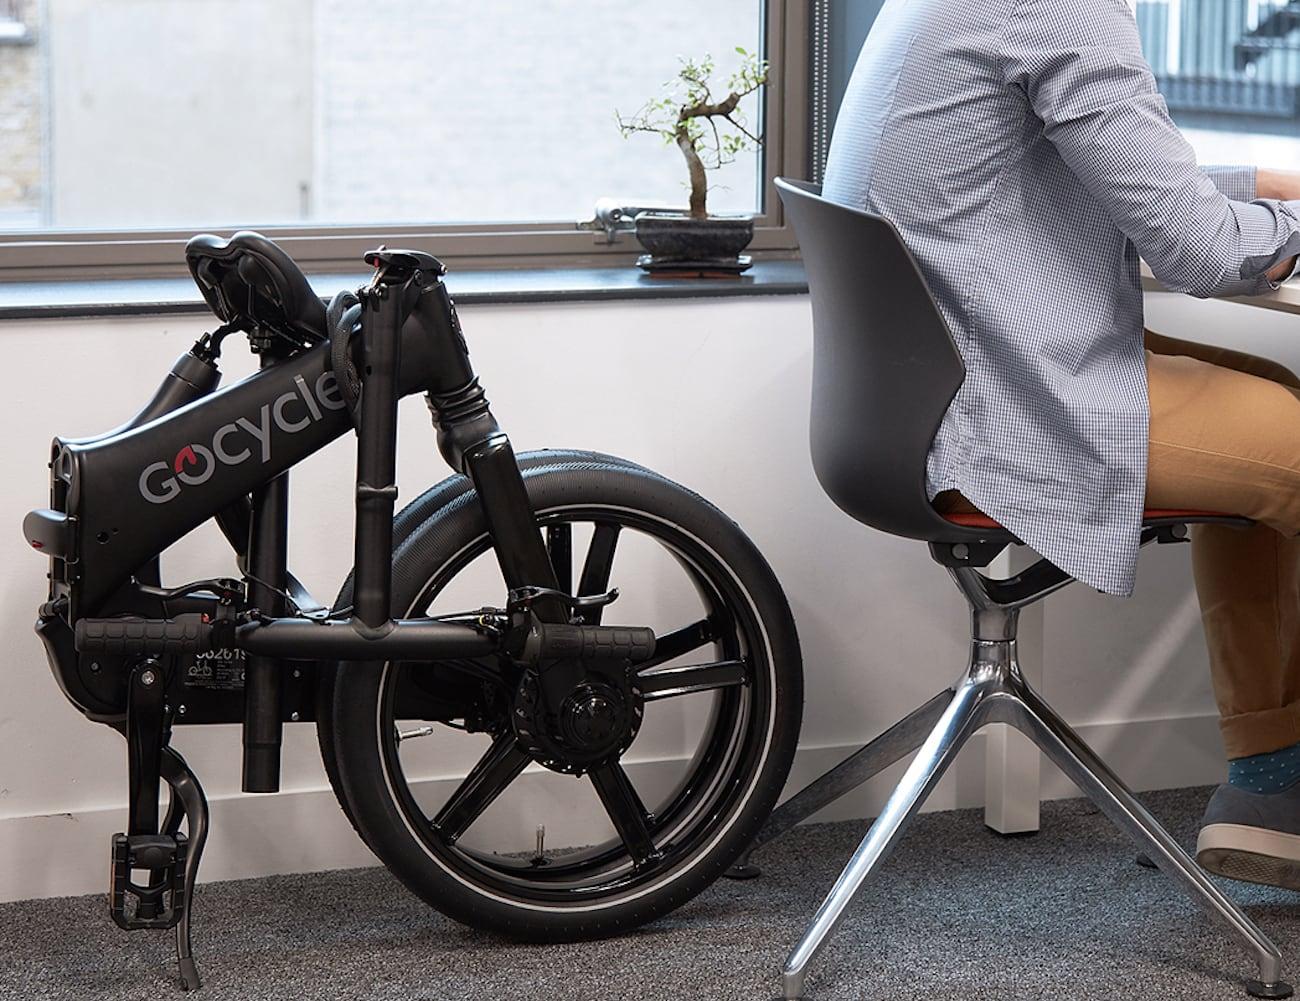 Gocycle GX Fast Folding Electric Bike